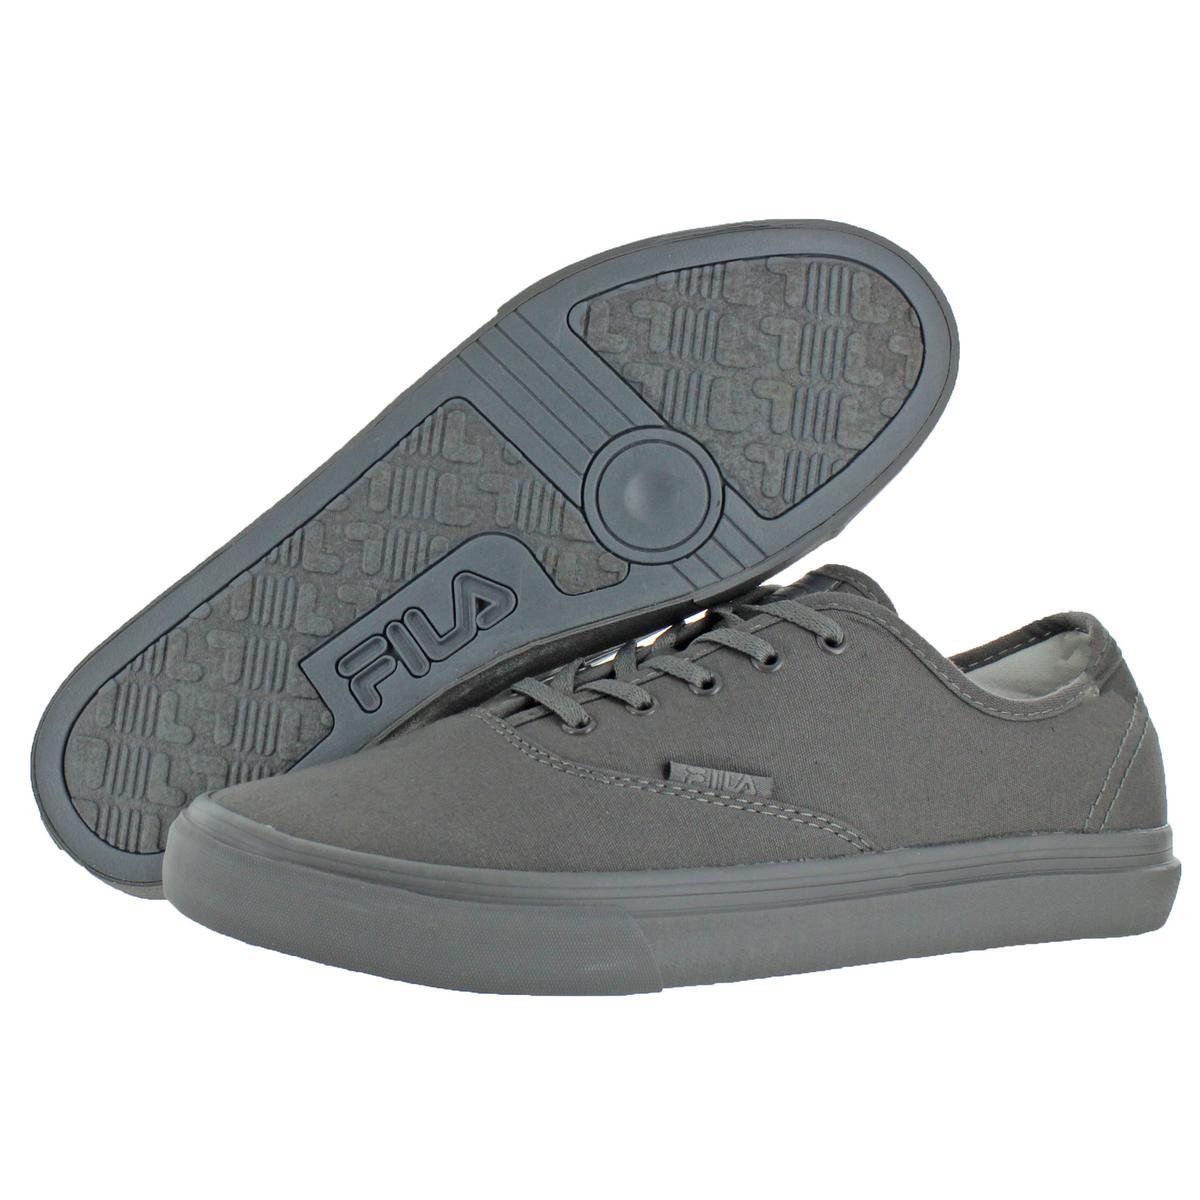 Fila-Classic-Canvas-Men-039-s-Fashion-Skate-Sneakers-Shoes thumbnail 4